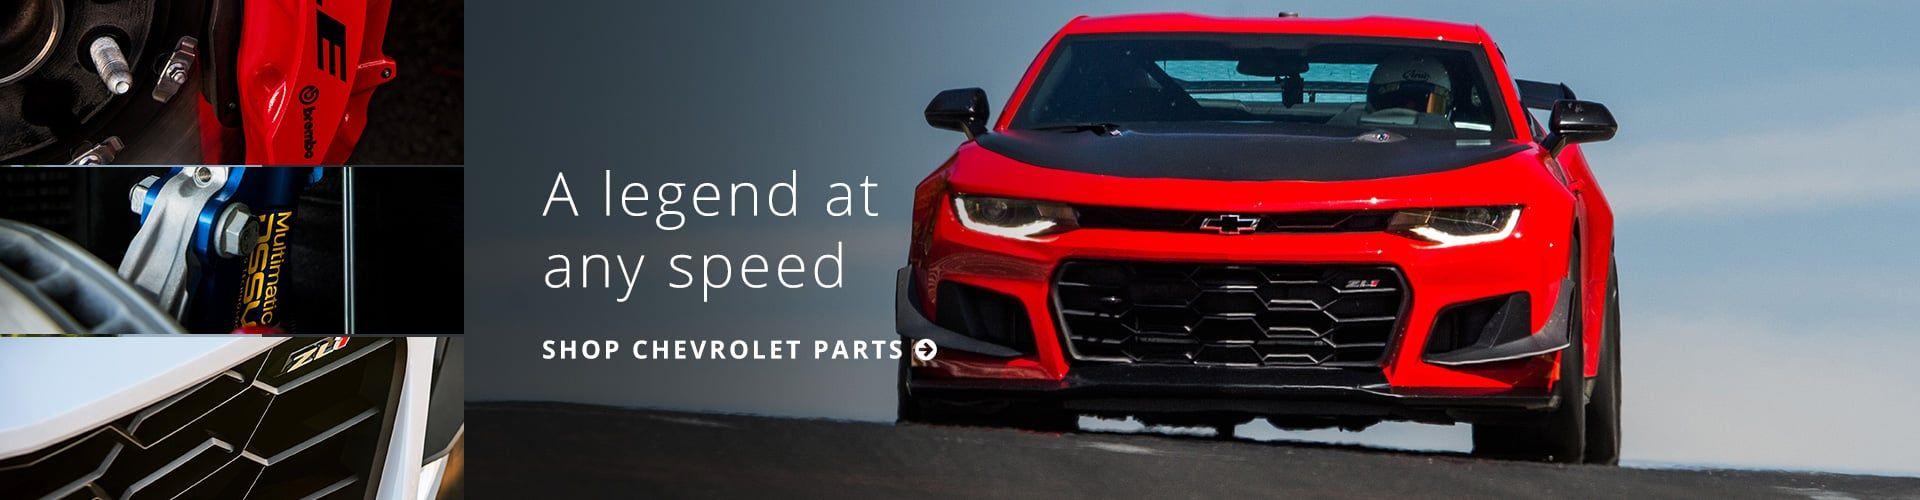 OEM Chevrolet Parts